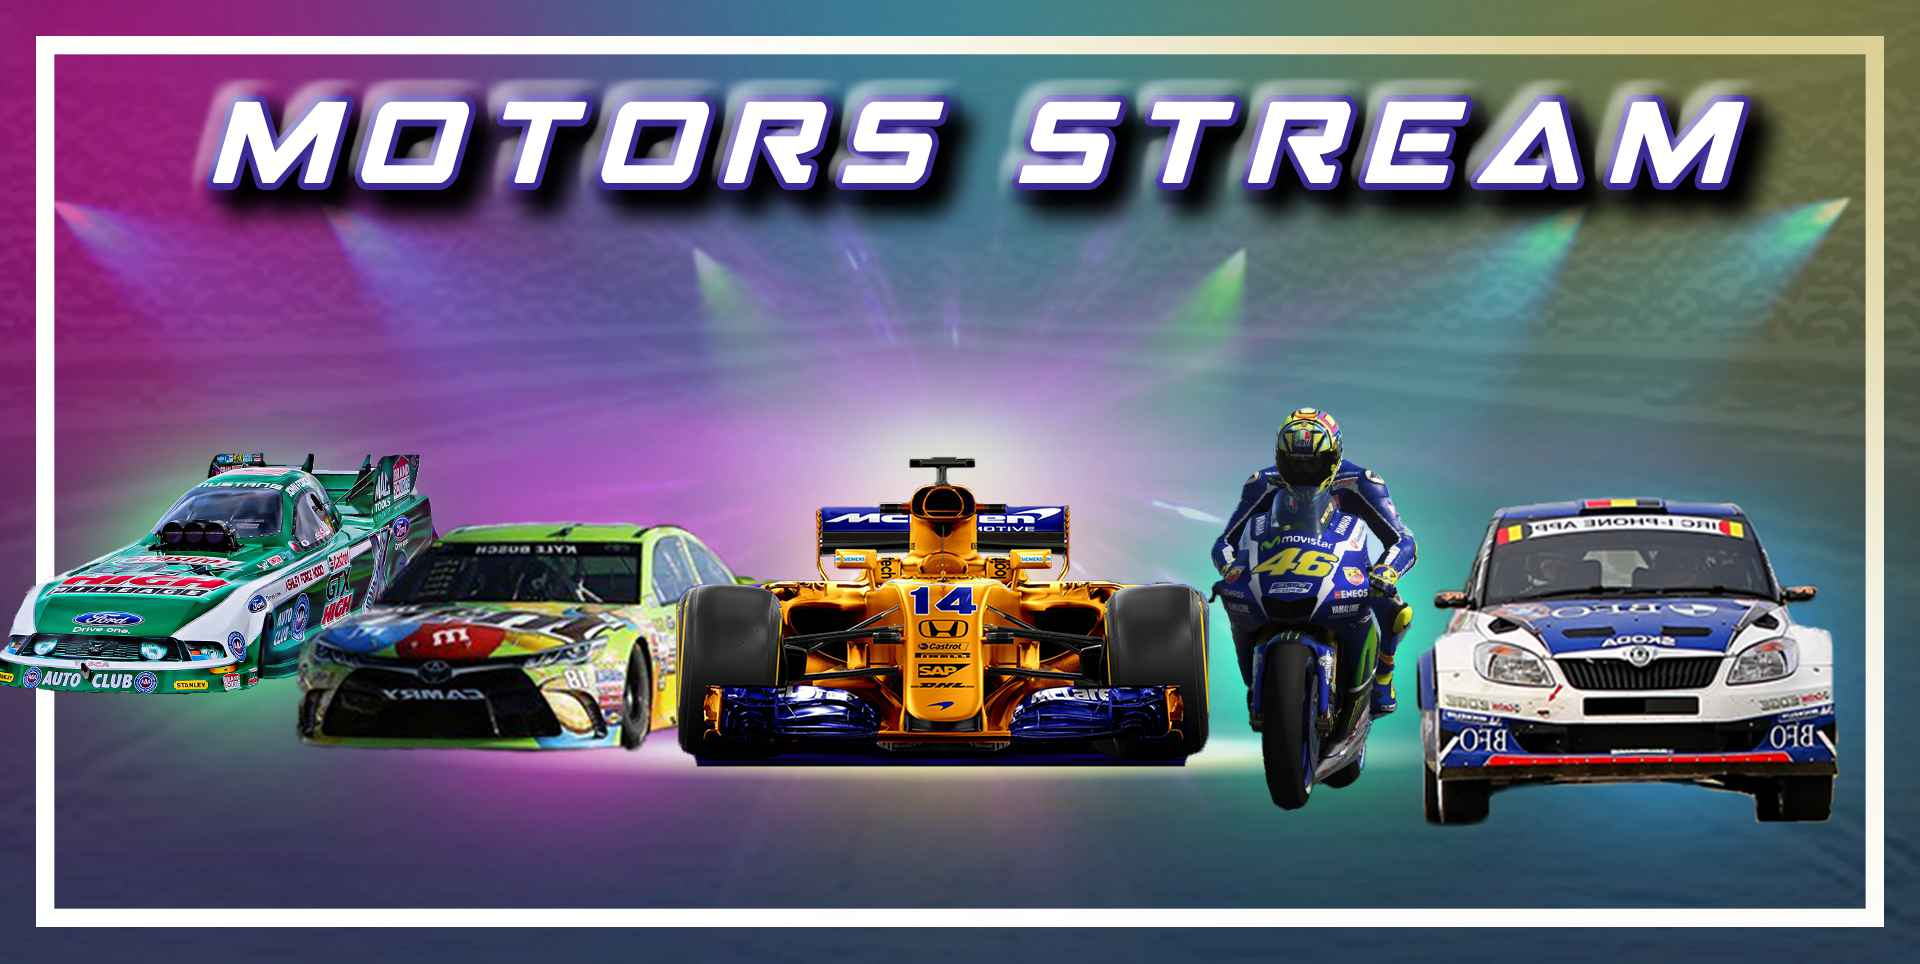 Daytona Supercross Series Live 2018